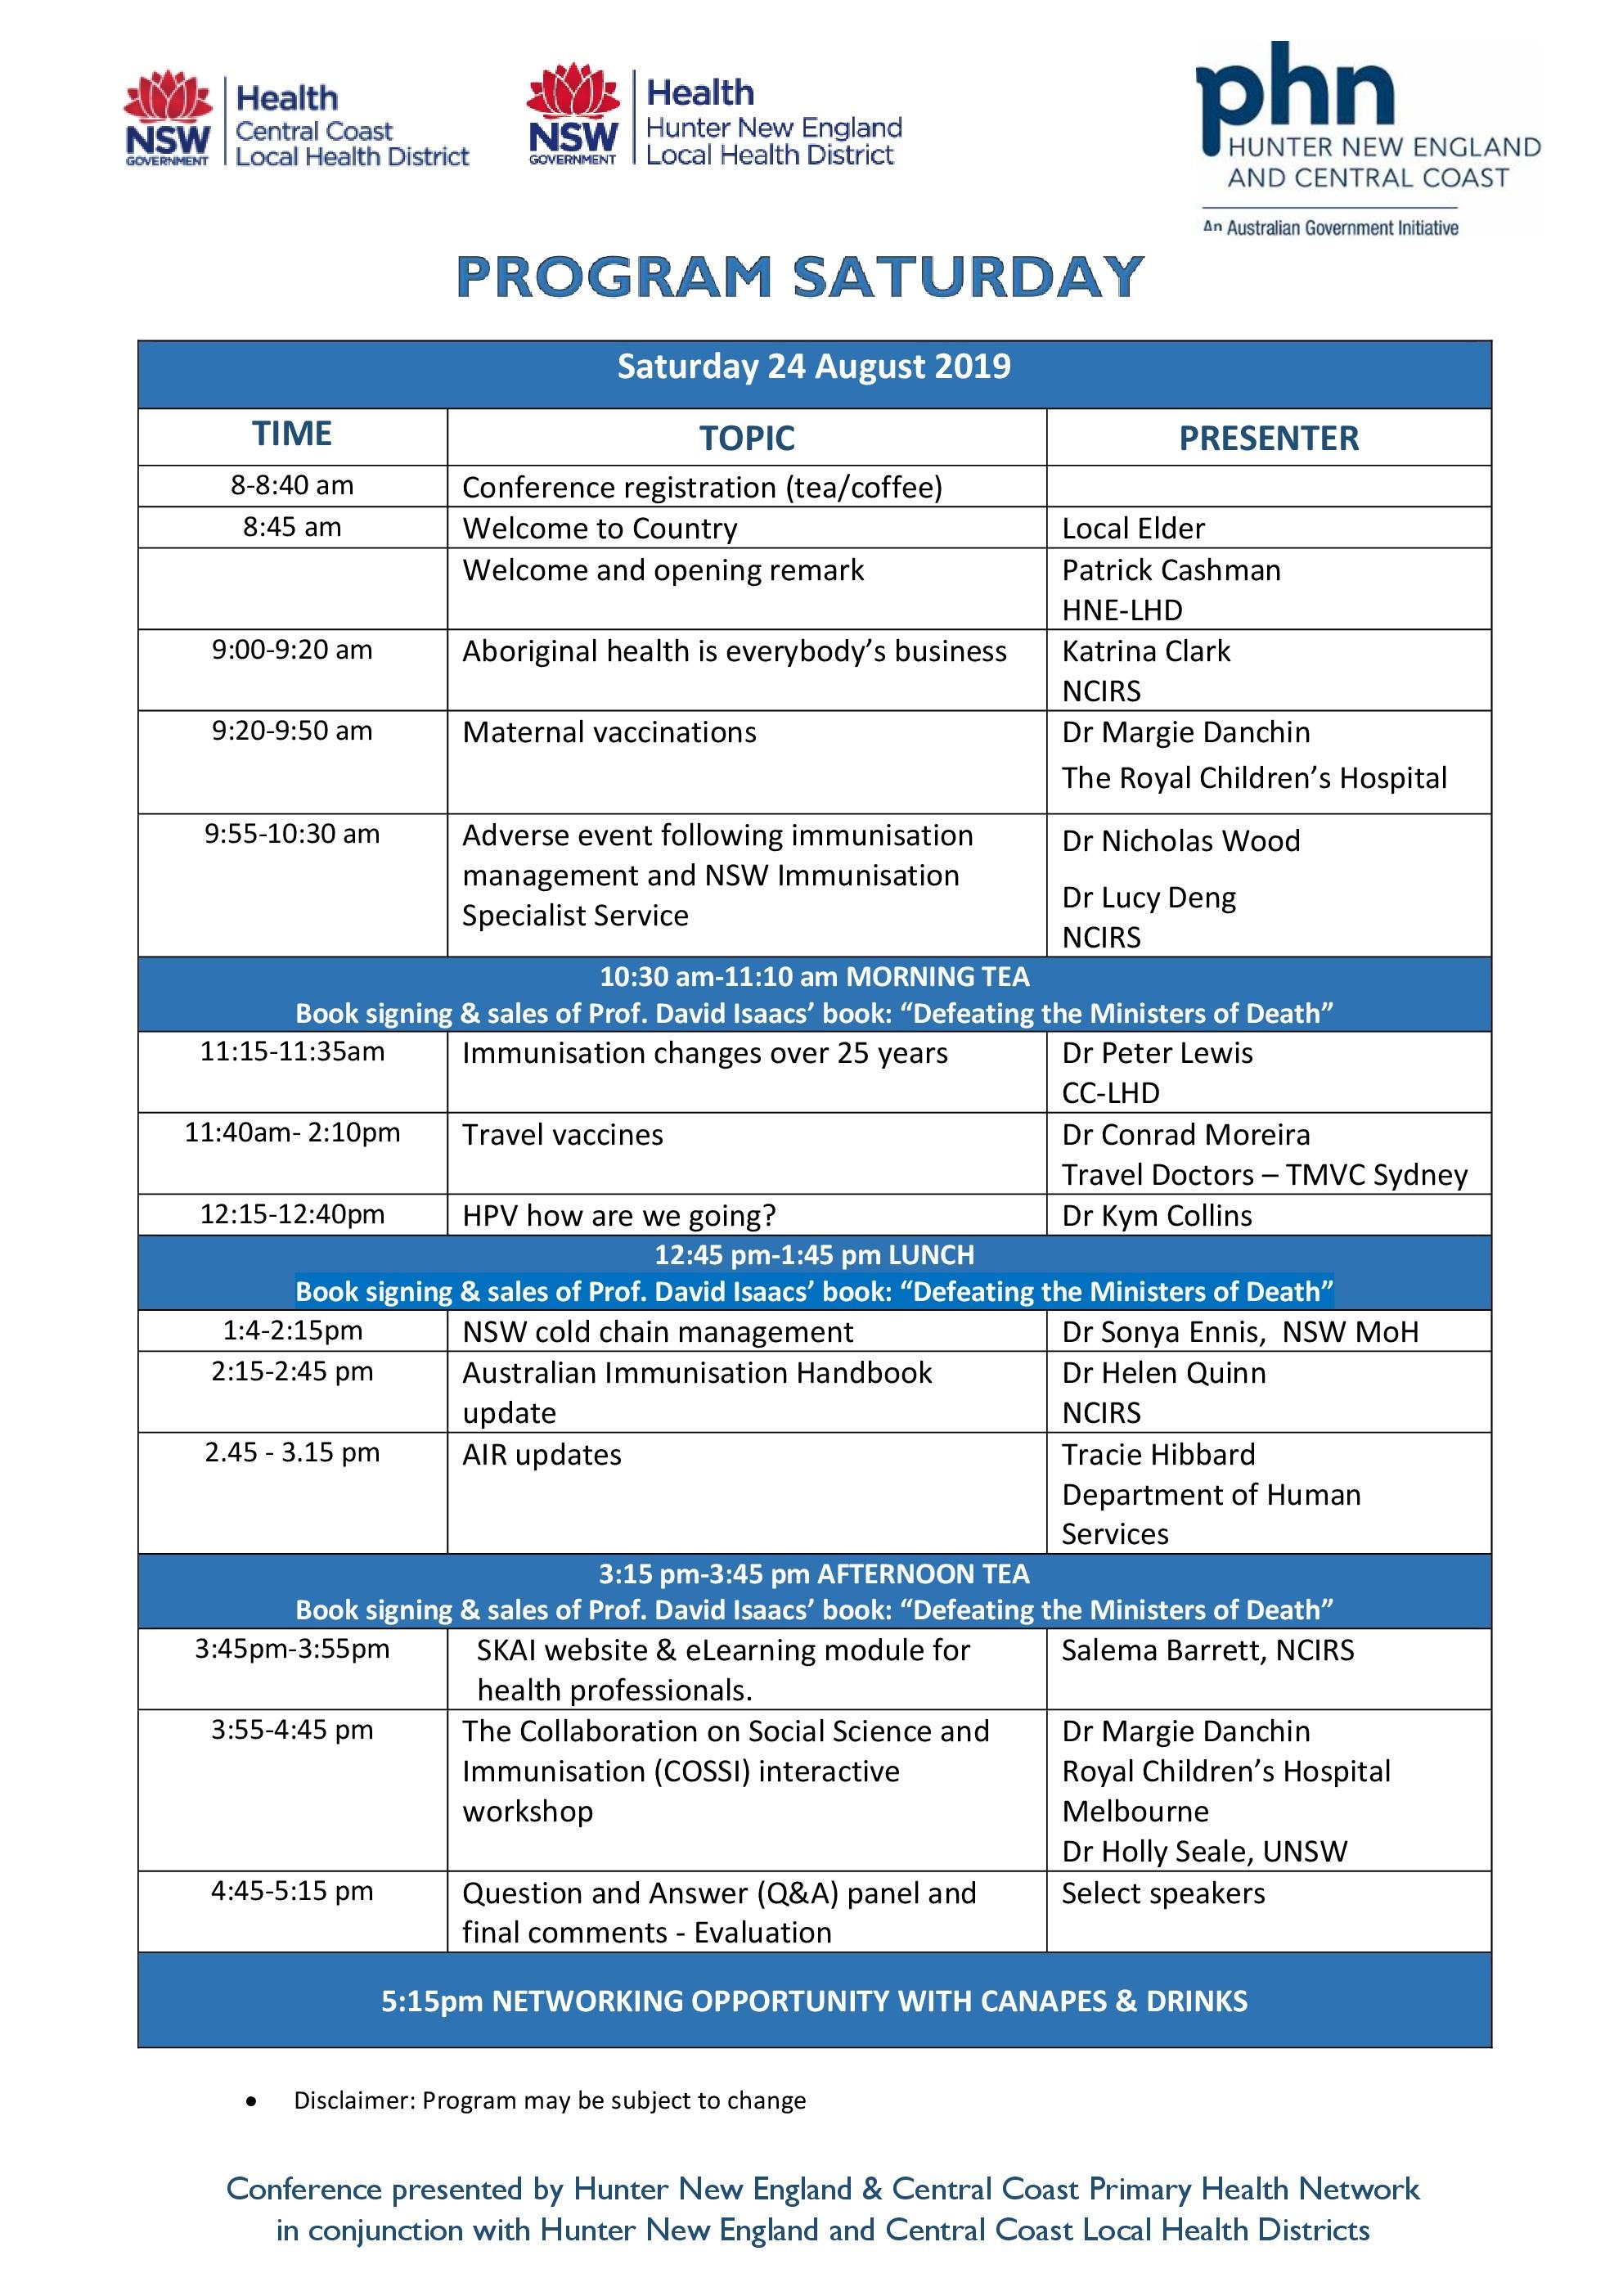 Program Saturday 24th August 2019